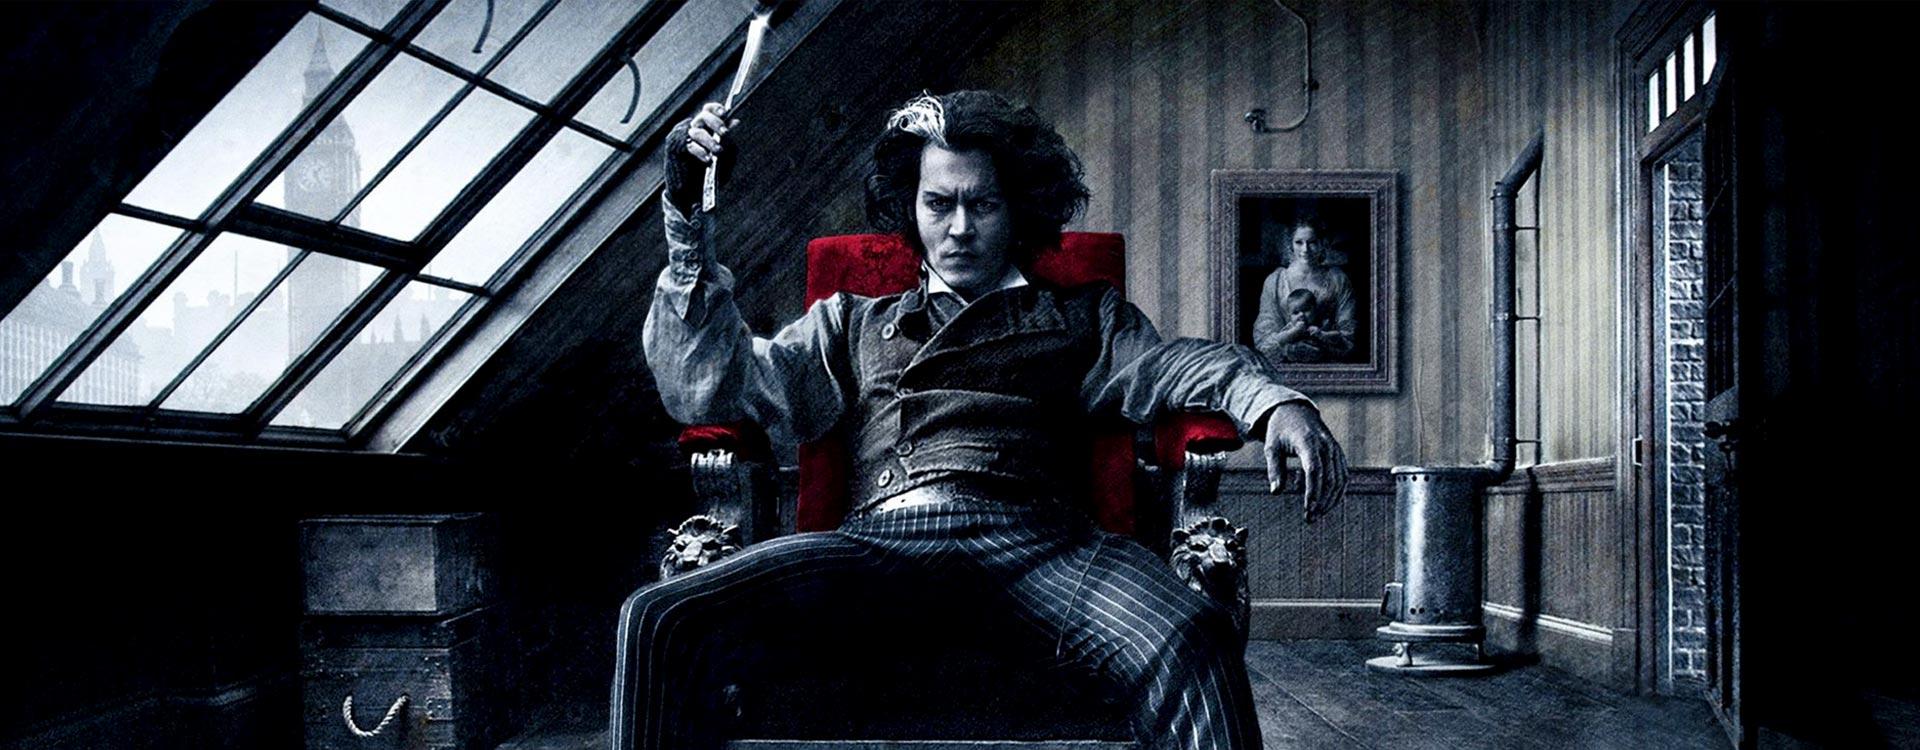 Sweeney Todd – Il diabolico barbiere di Fleet Street